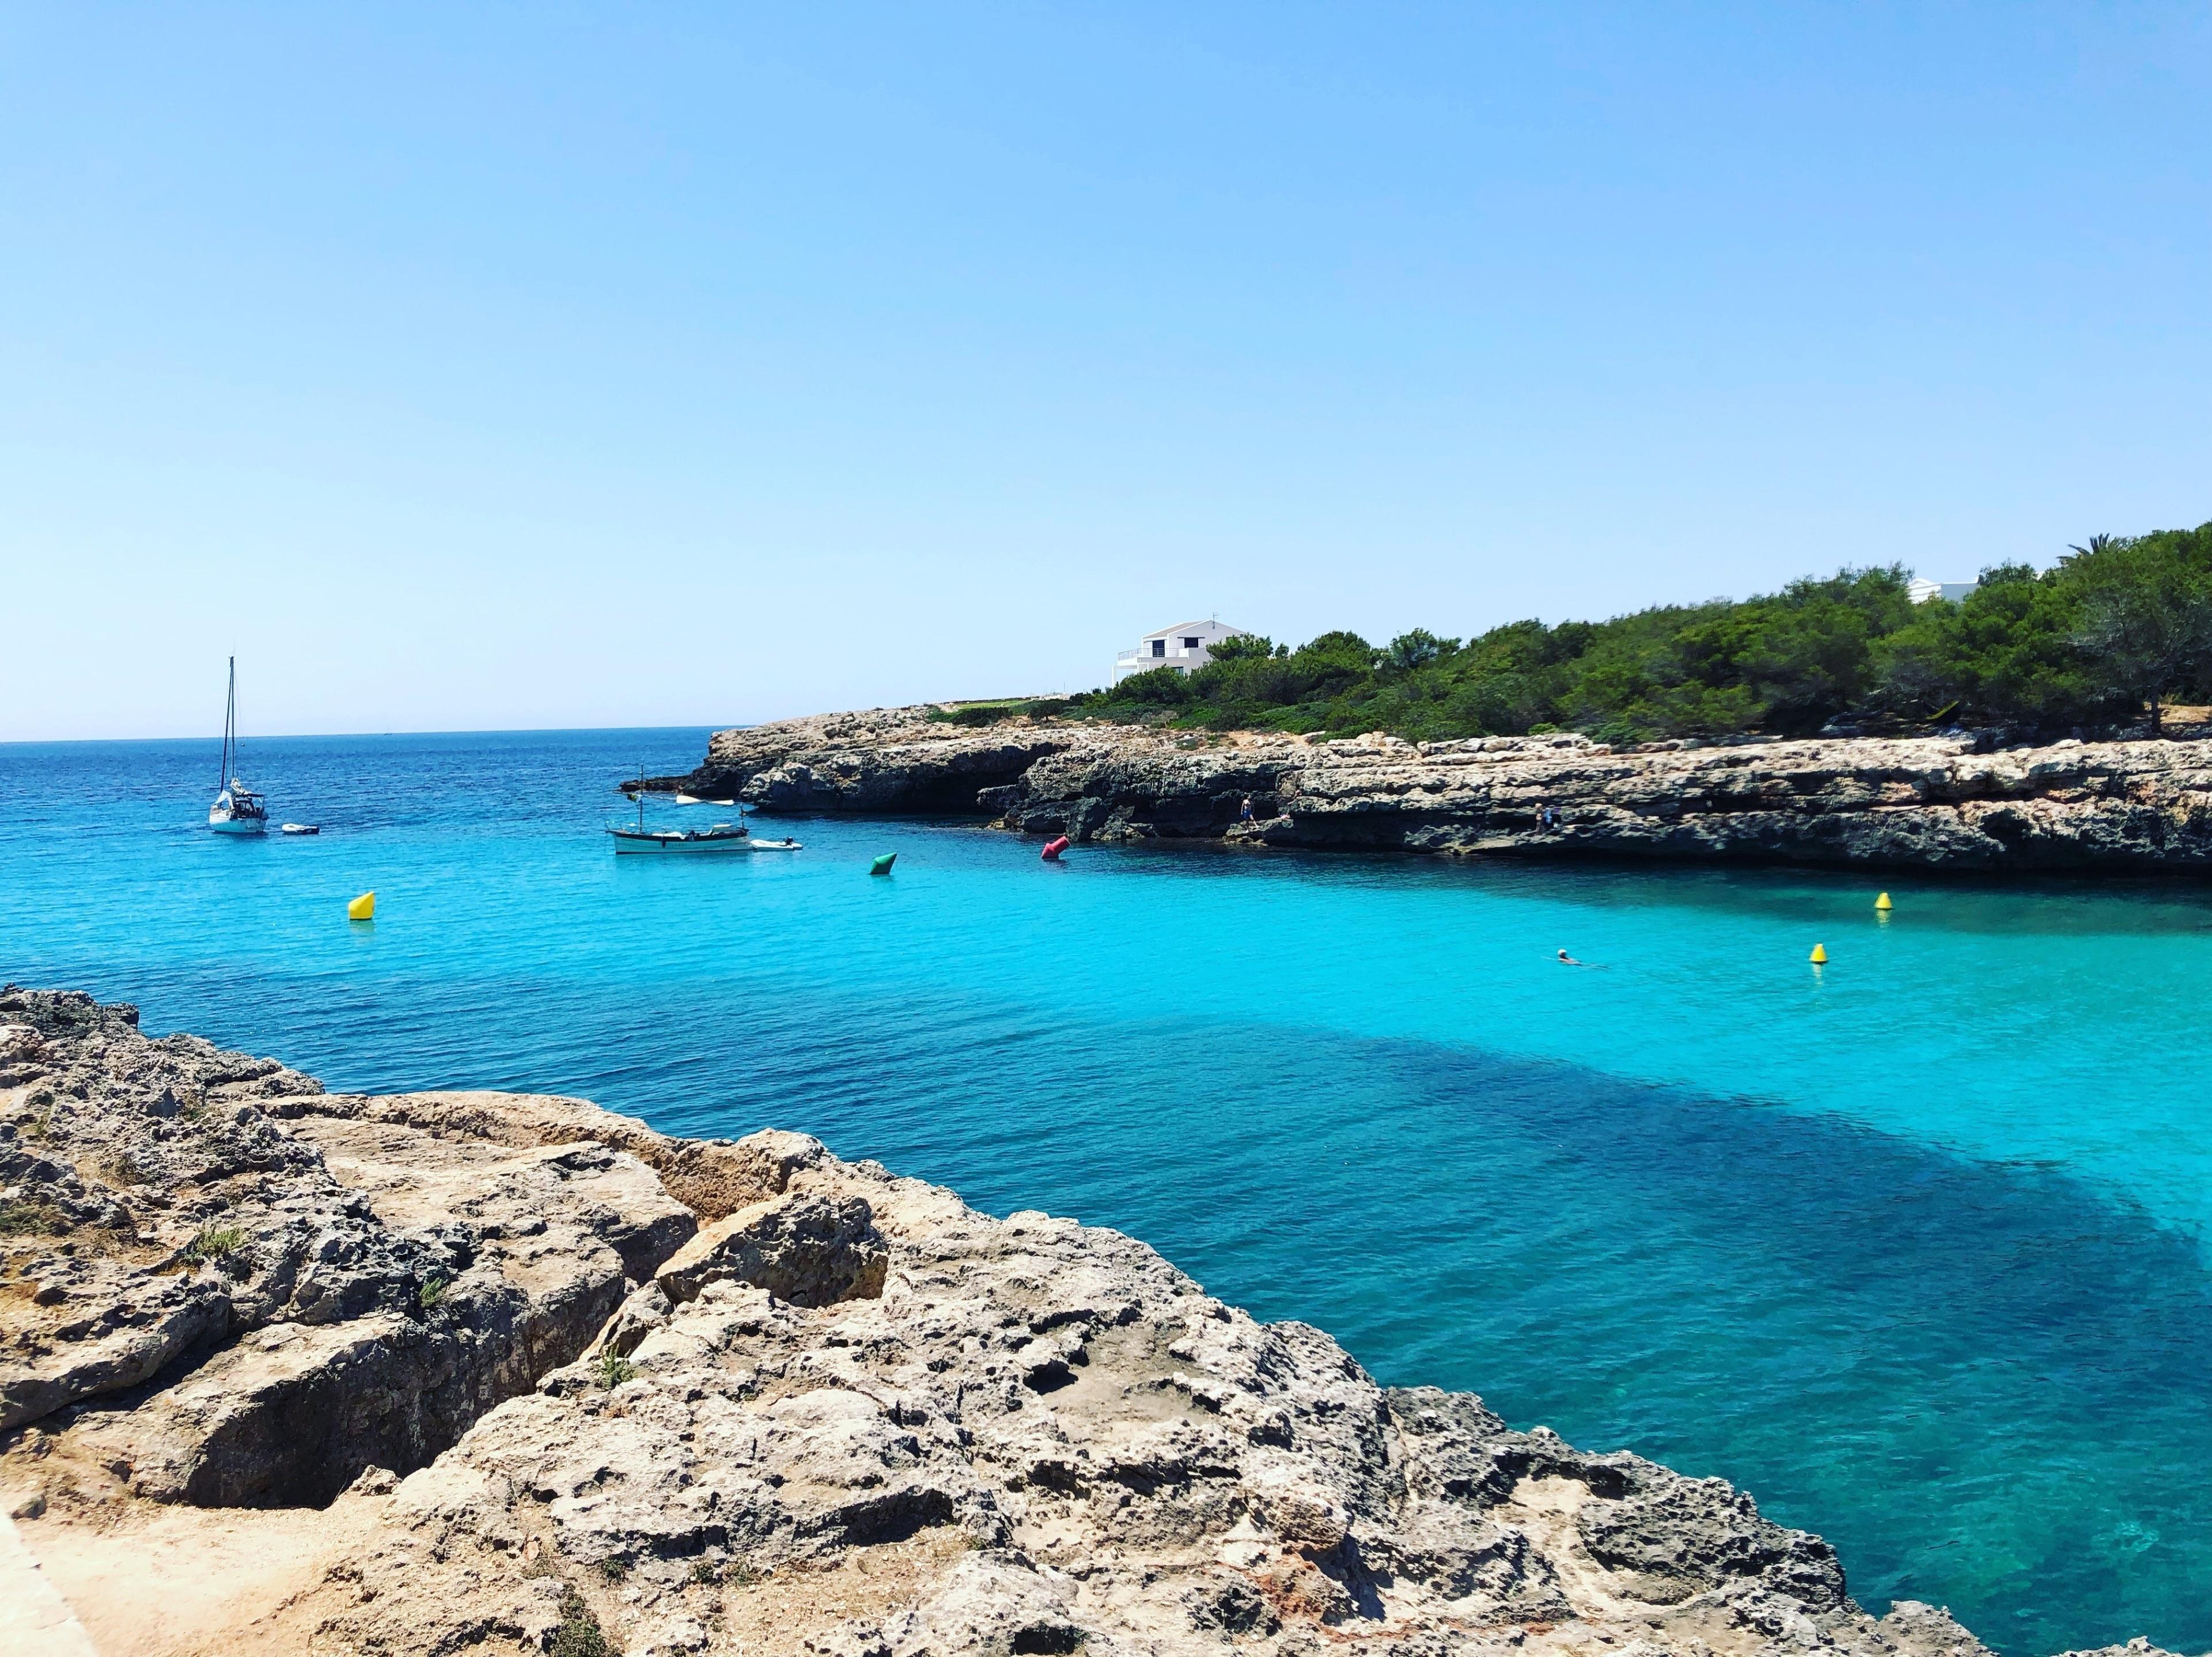 Cala Blanca, Ciutadella de Menorca, Balearic Islands, Spain